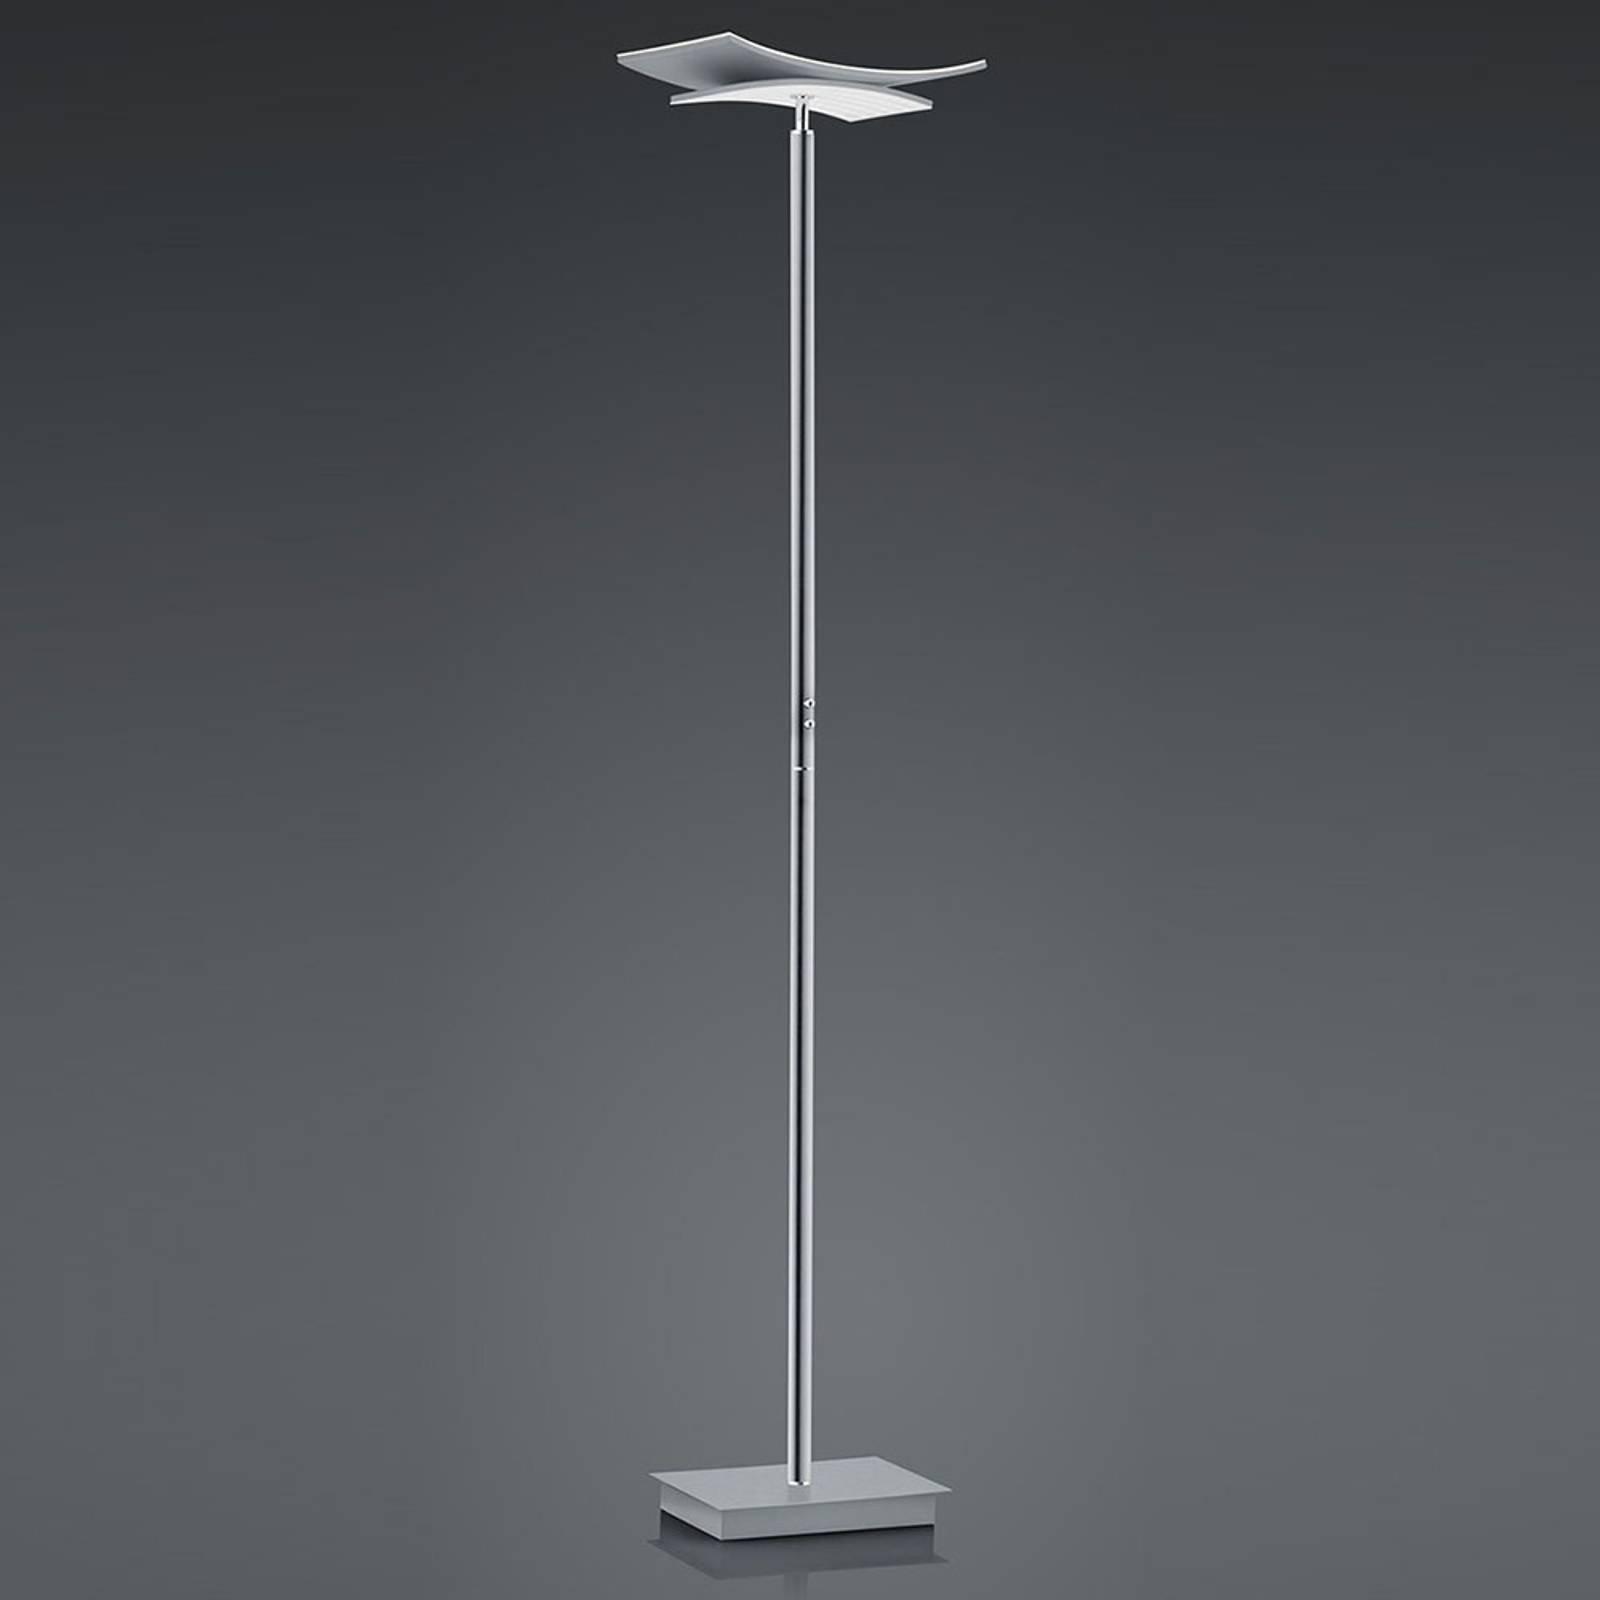 B-Leuchten Liberty LED-gulvlampe, matt nikkel